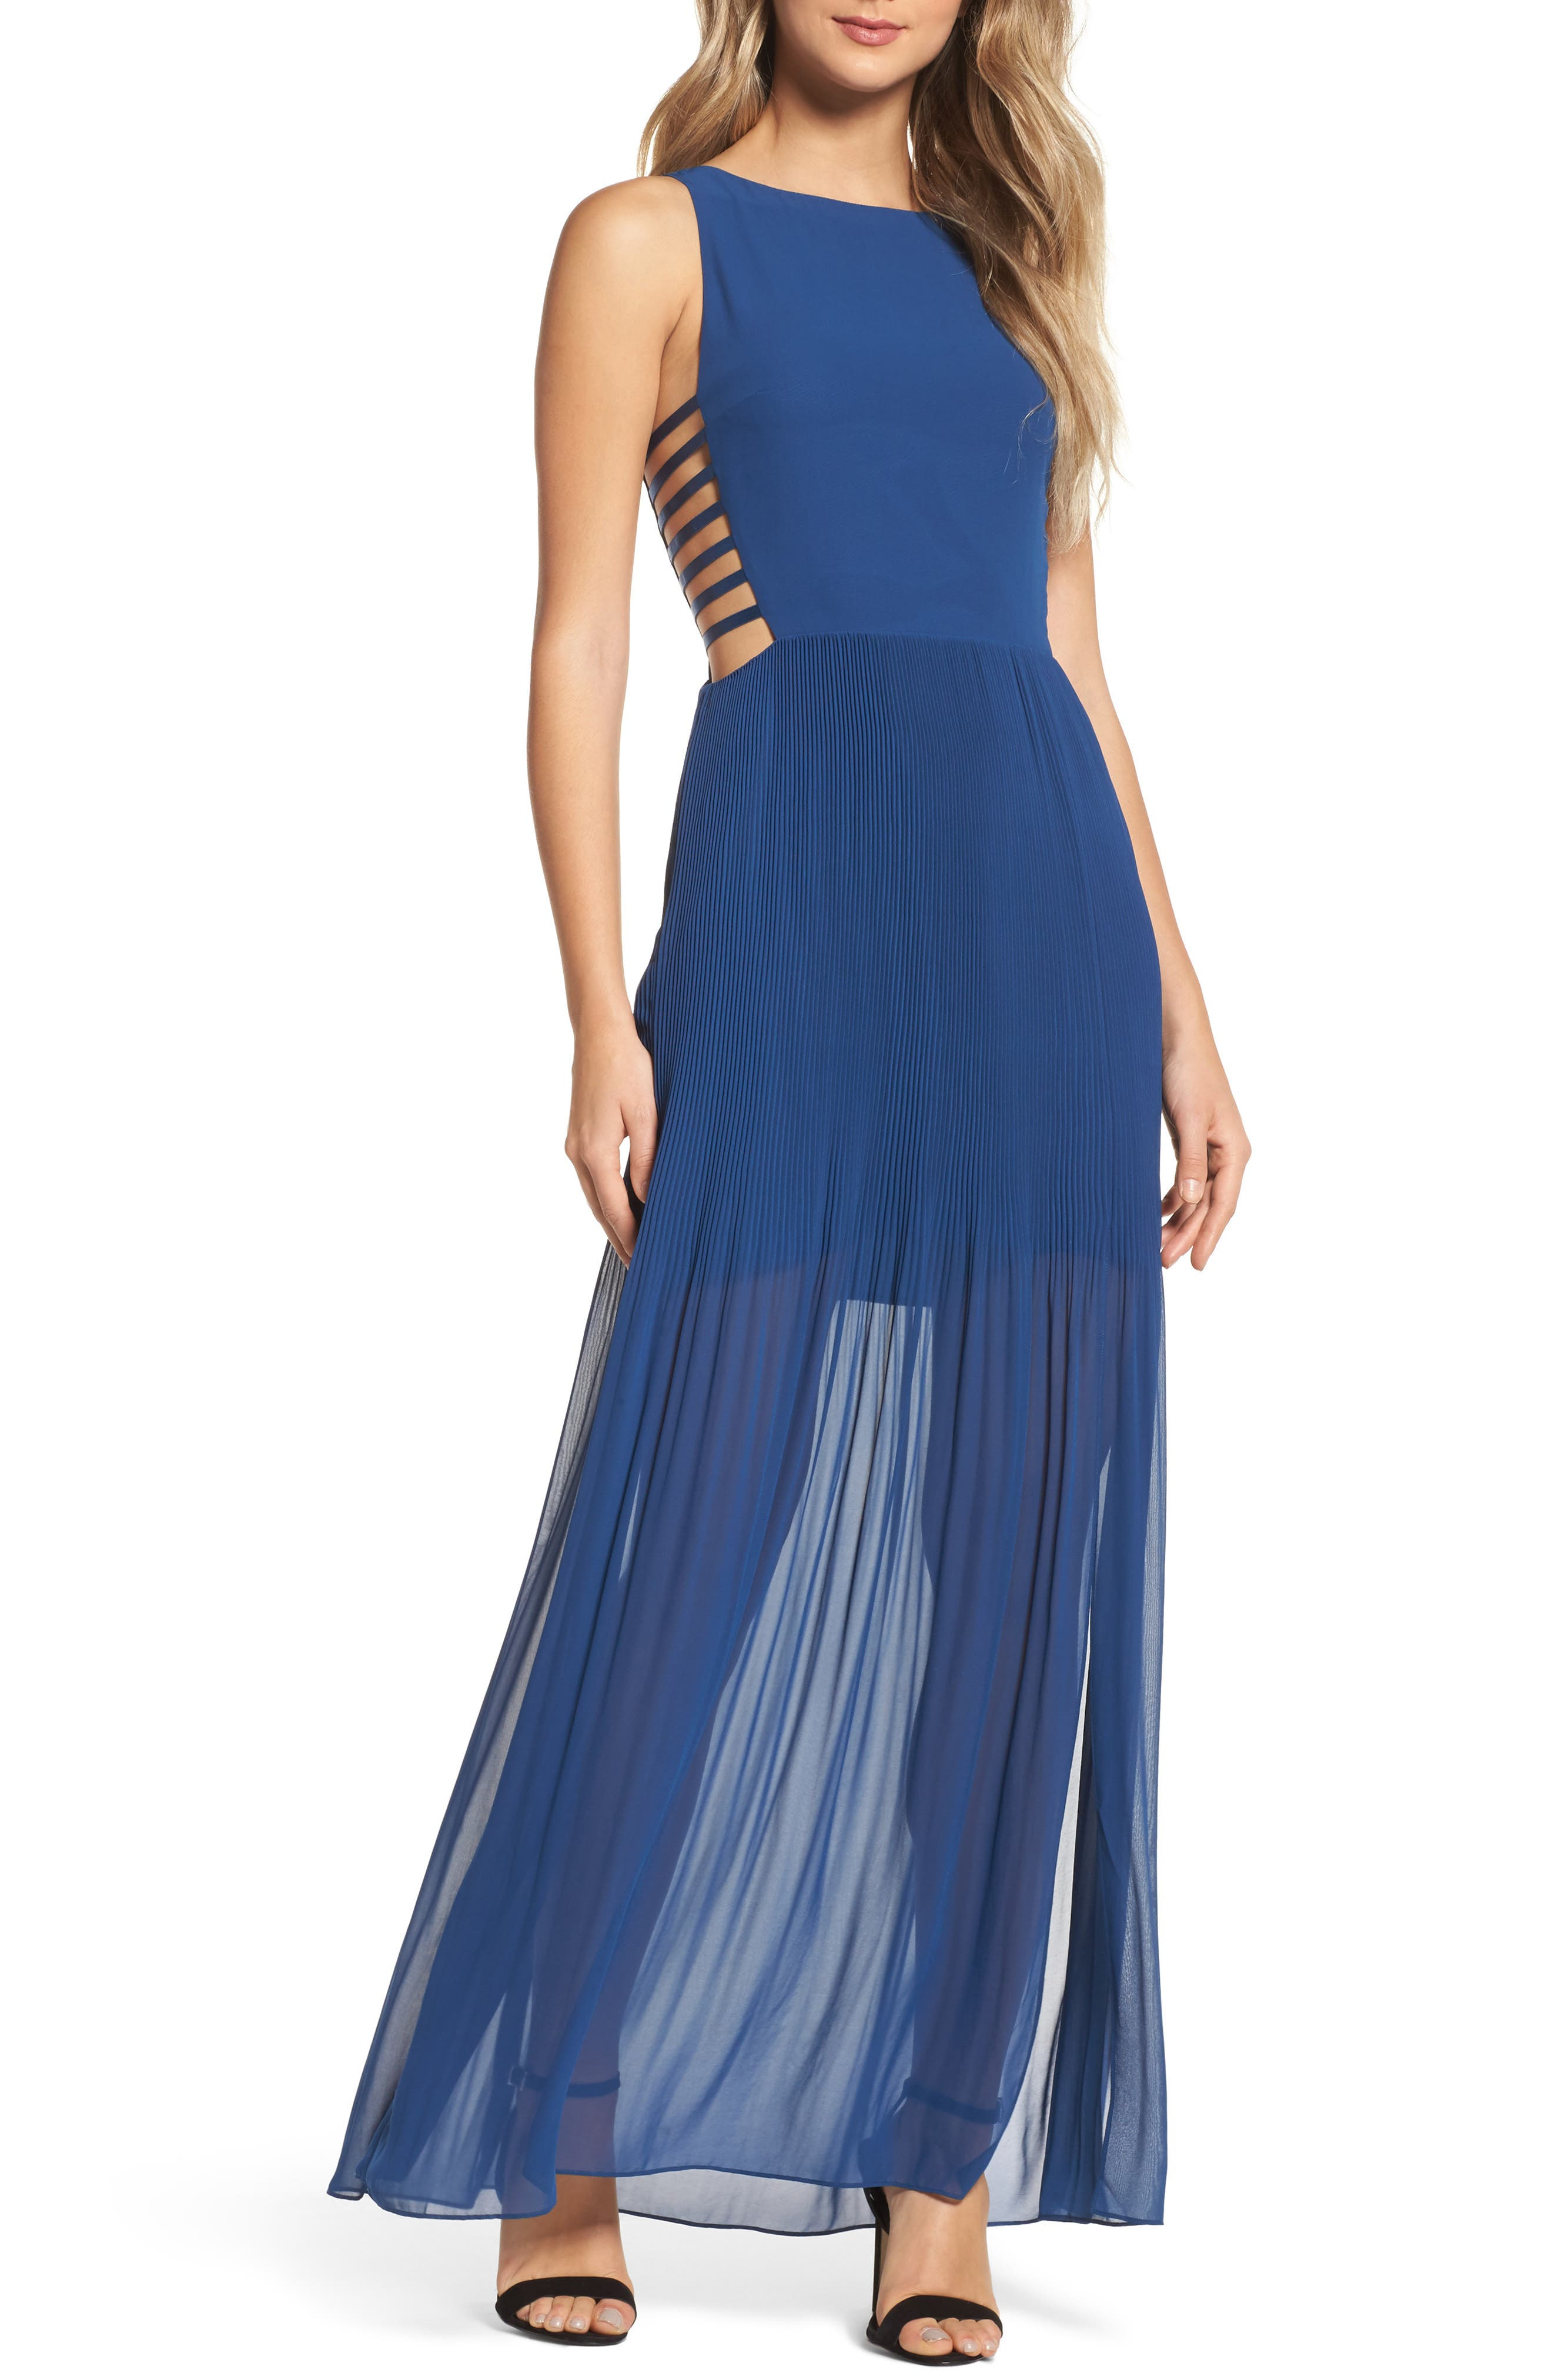 Sunset Blvd Maxi Dress,                             Main thumbnail 2, color,